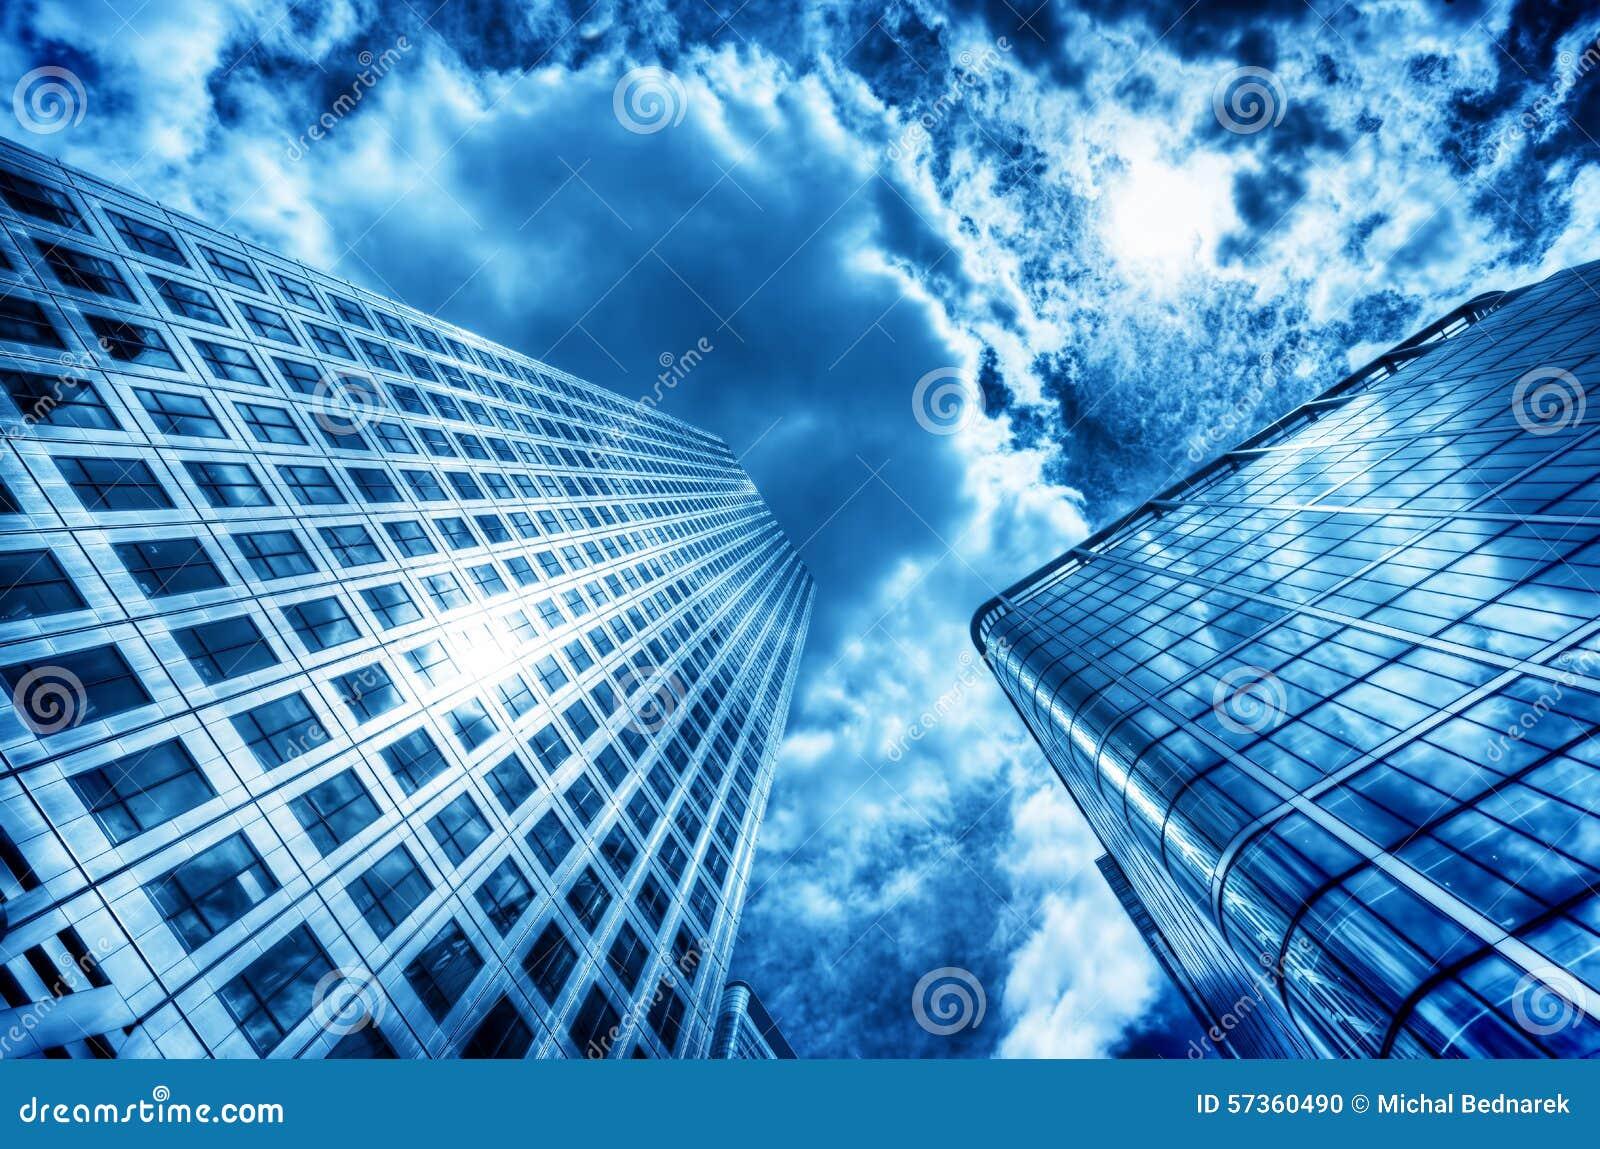 Sun reflecting in modern business skyscraper, high-rise building